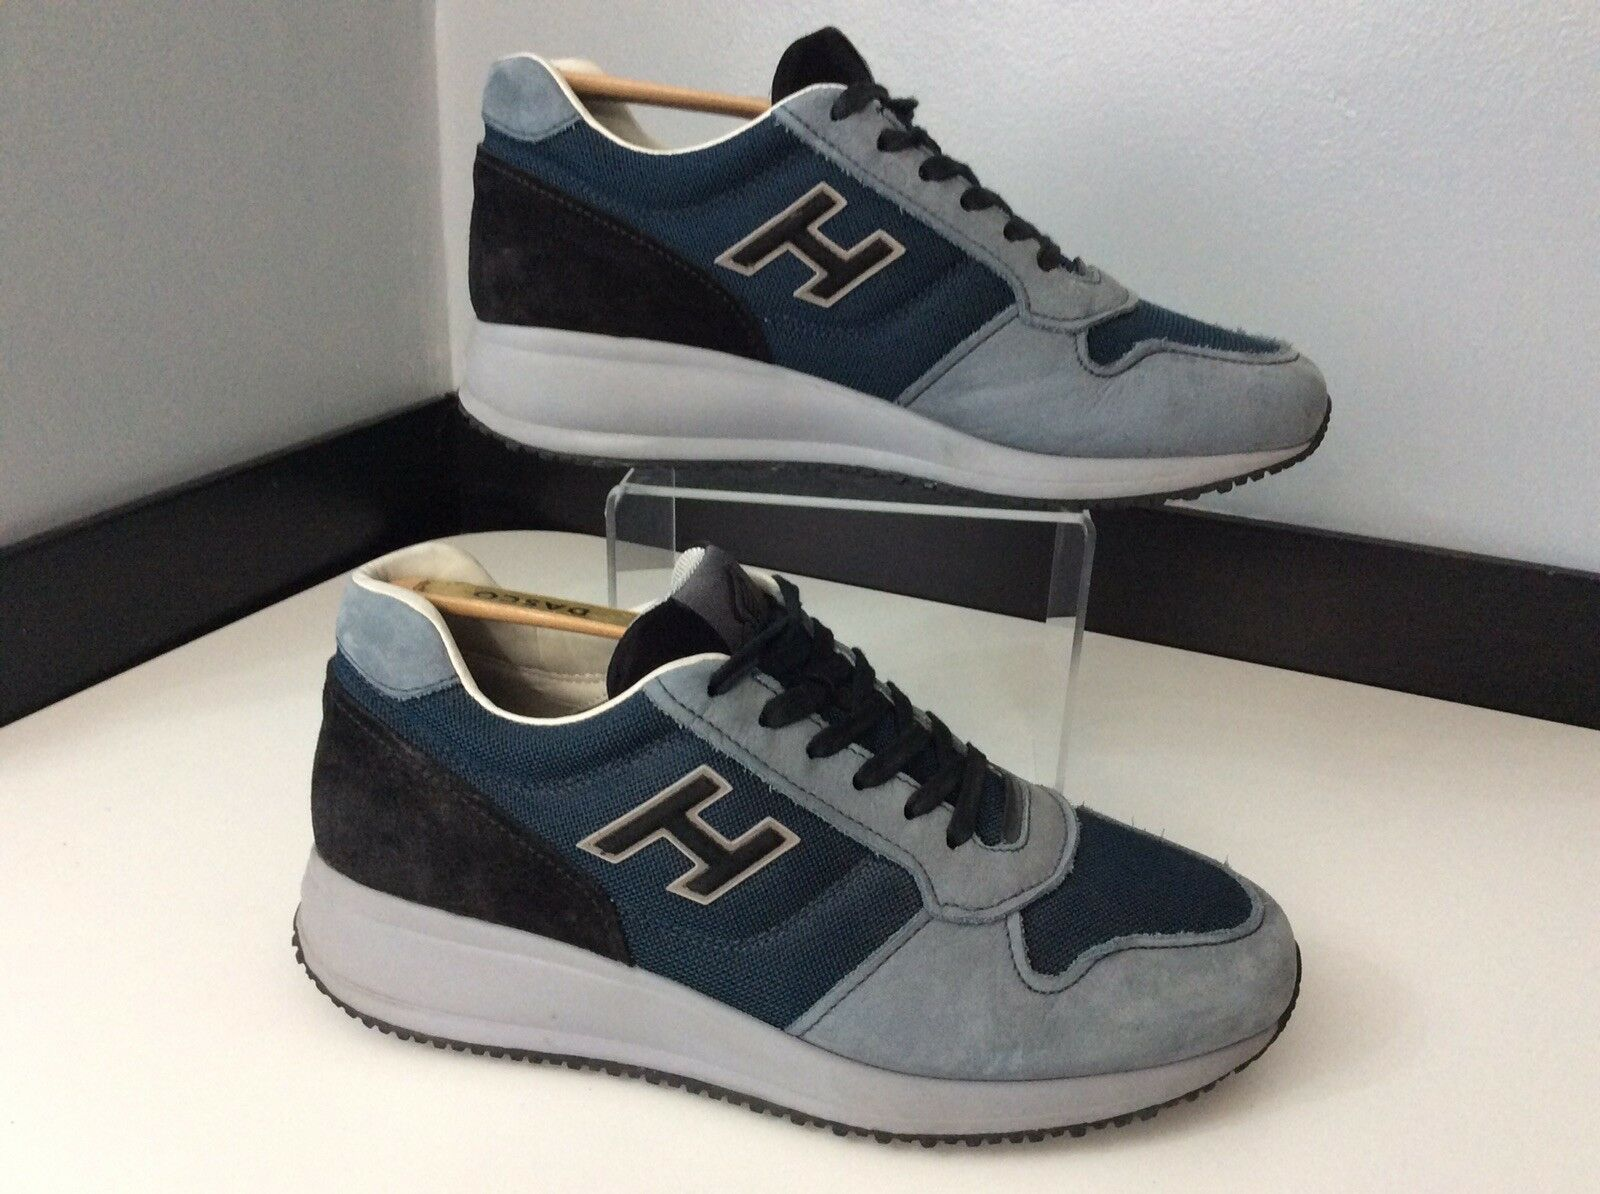 Hogans Mens Sneakers, Eu39.5 bluee, Trainers